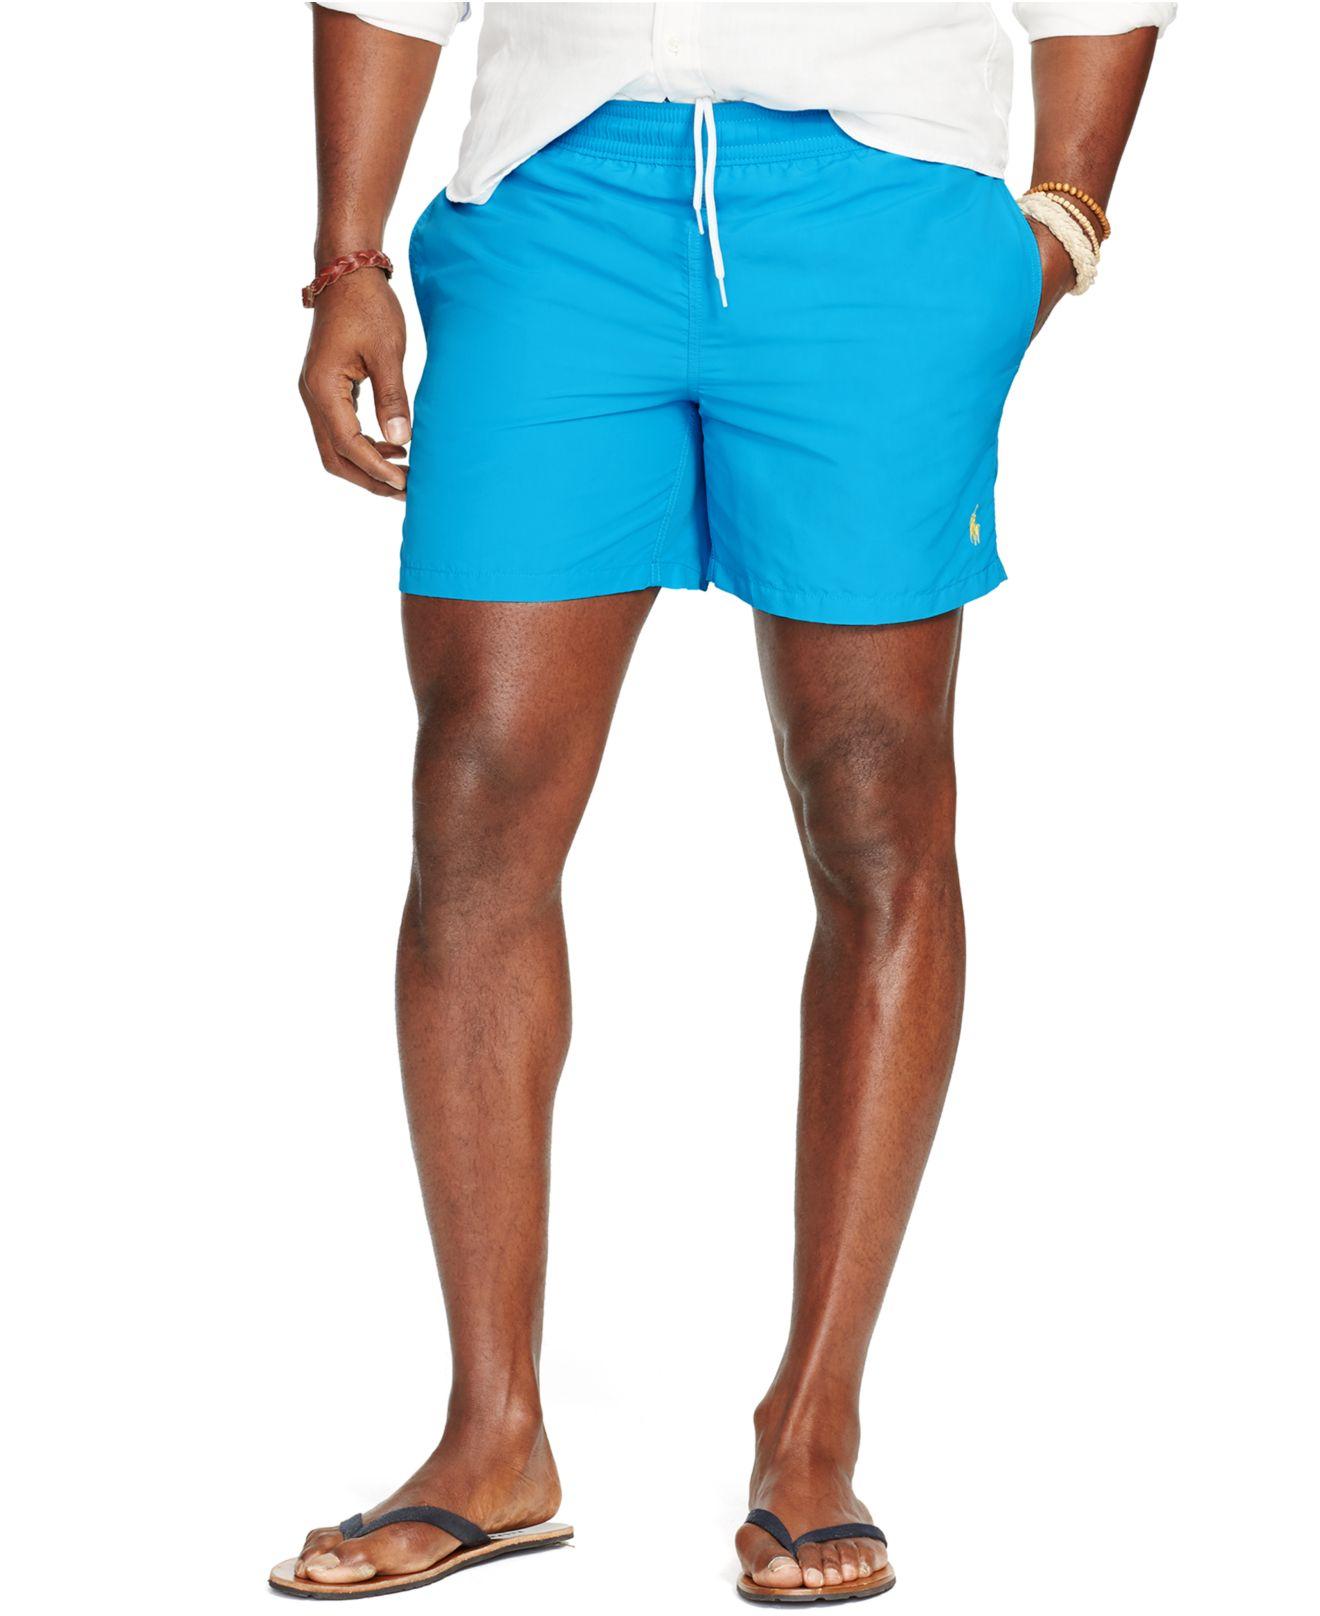 b02135c602 ... shopping lyst polo ralph lauren big and tall nylon hawaiian swim shorts  in d7879 8c752